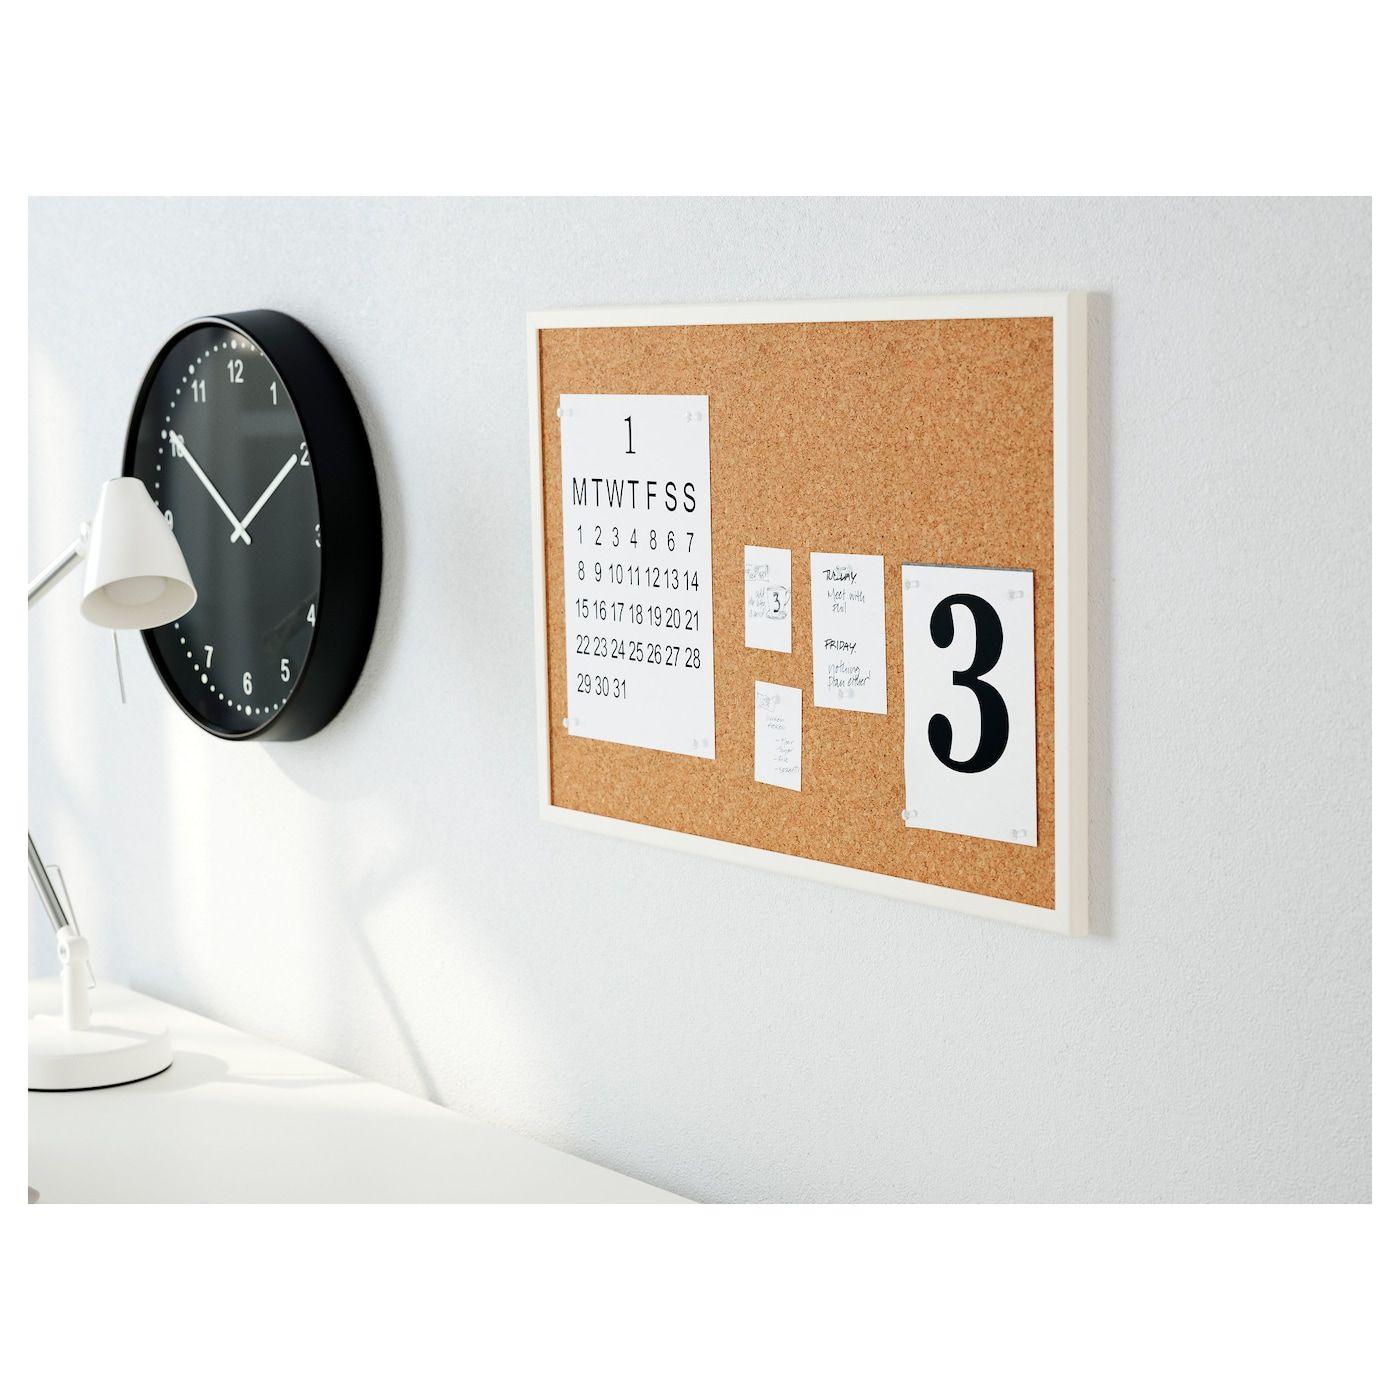 Ikea Mobler Inredning Och Inspiration Tableau Affichage Tableau Liege Panneau Liege